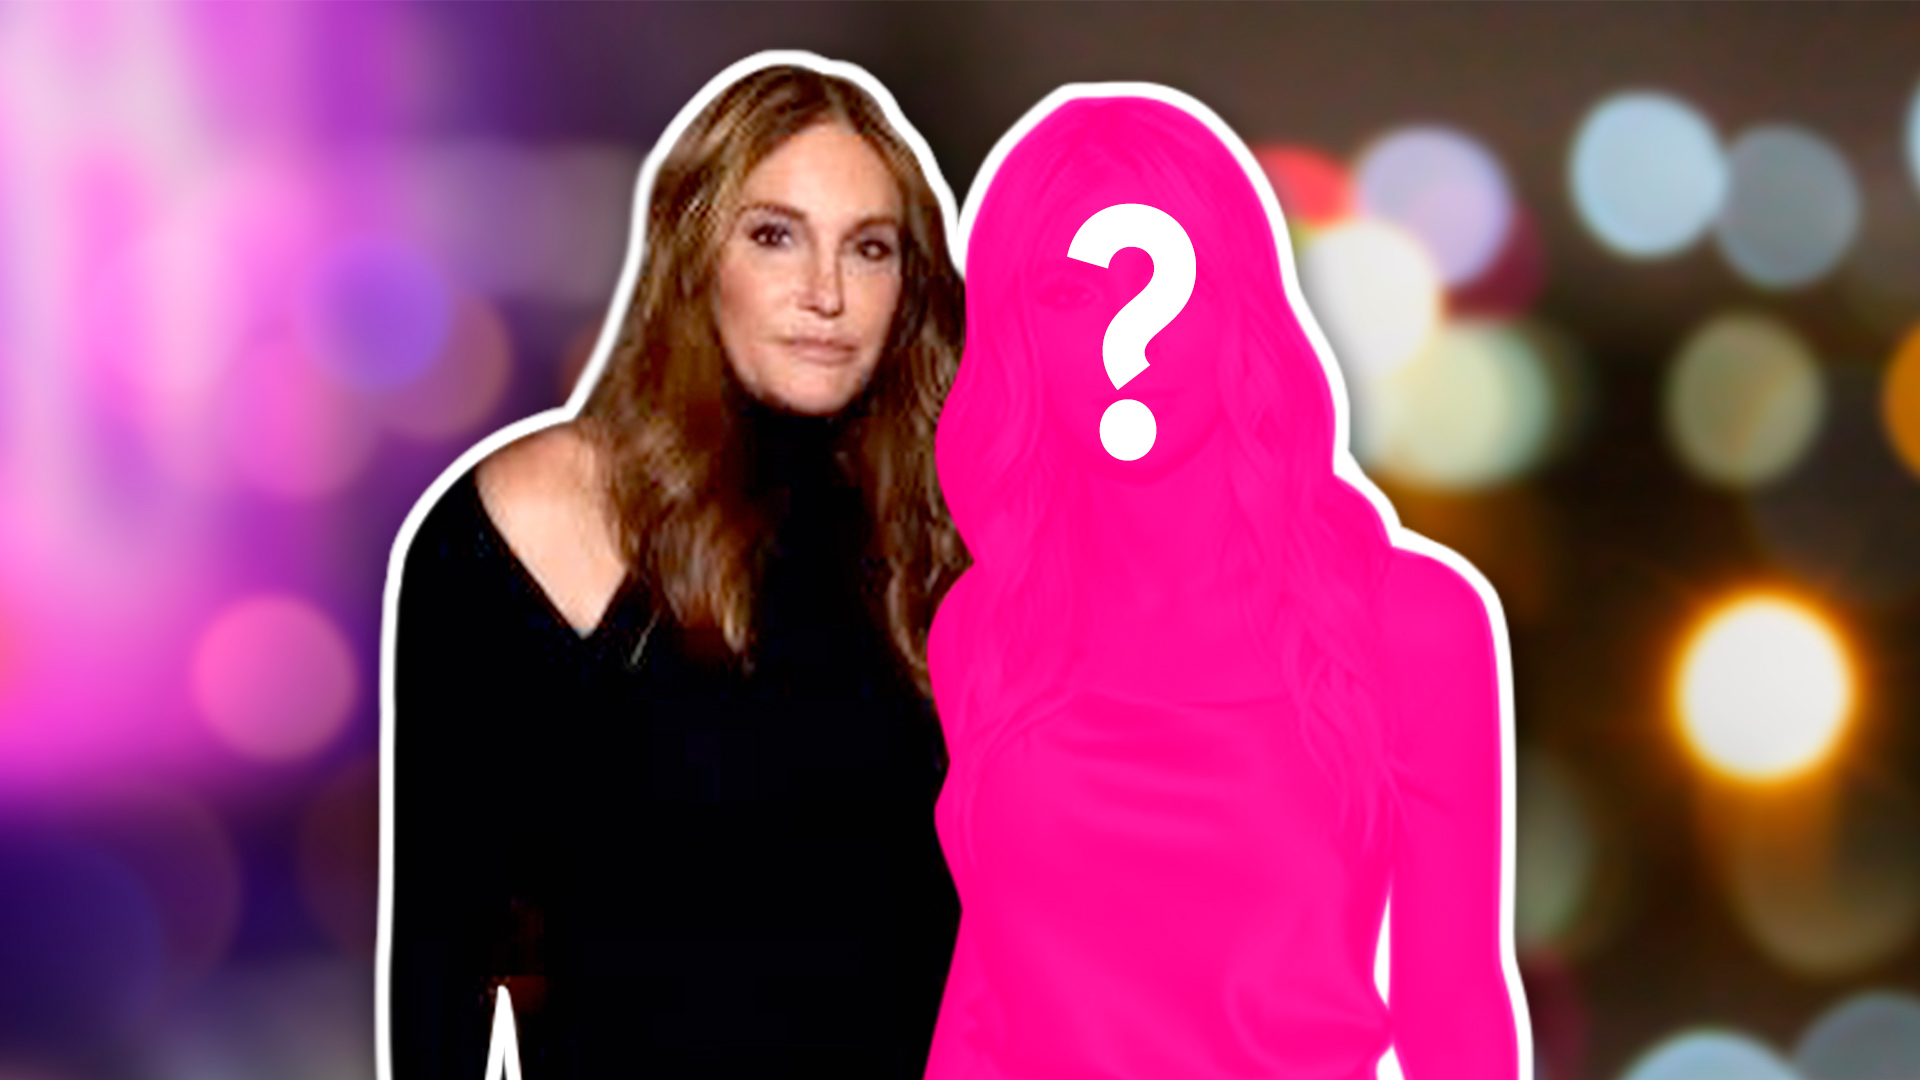 Esta es la misteriosa acompañante de Caitlyn Jenner... ¿serán pareja?